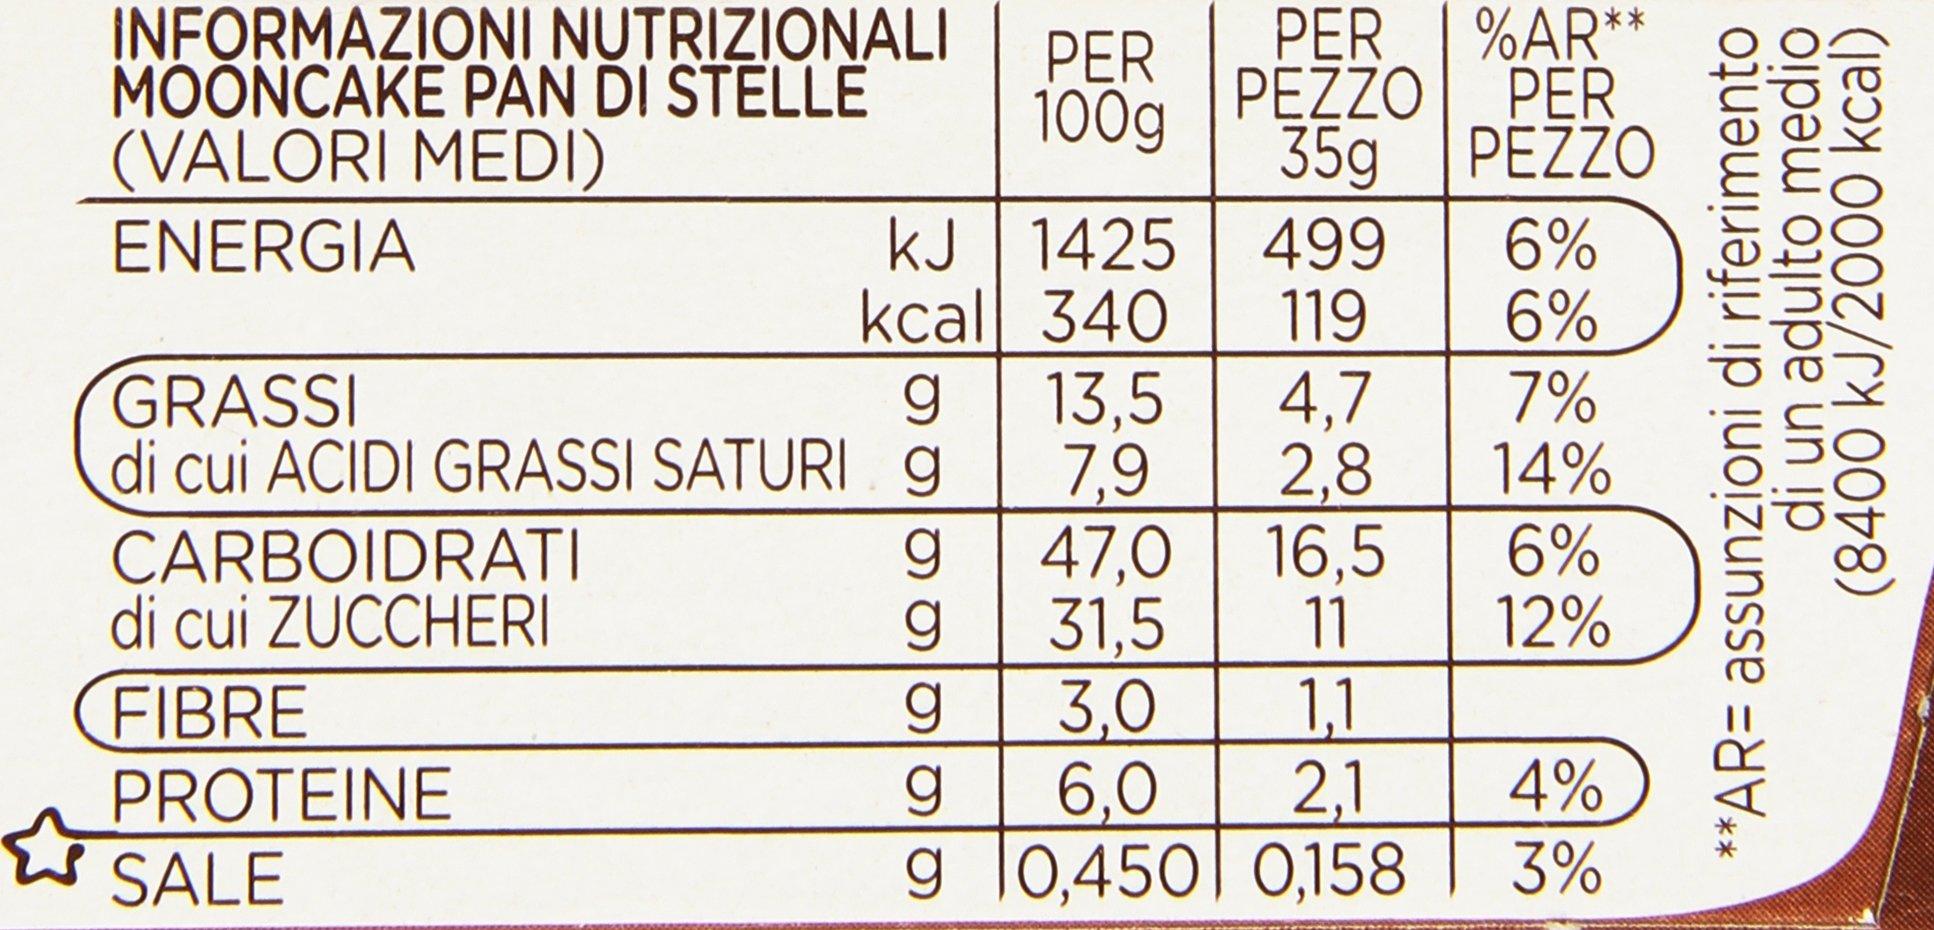 Mulino Bianco Pan Di Stelle Mooncake 6x35g Buy Online In India At Desertcart 68203696